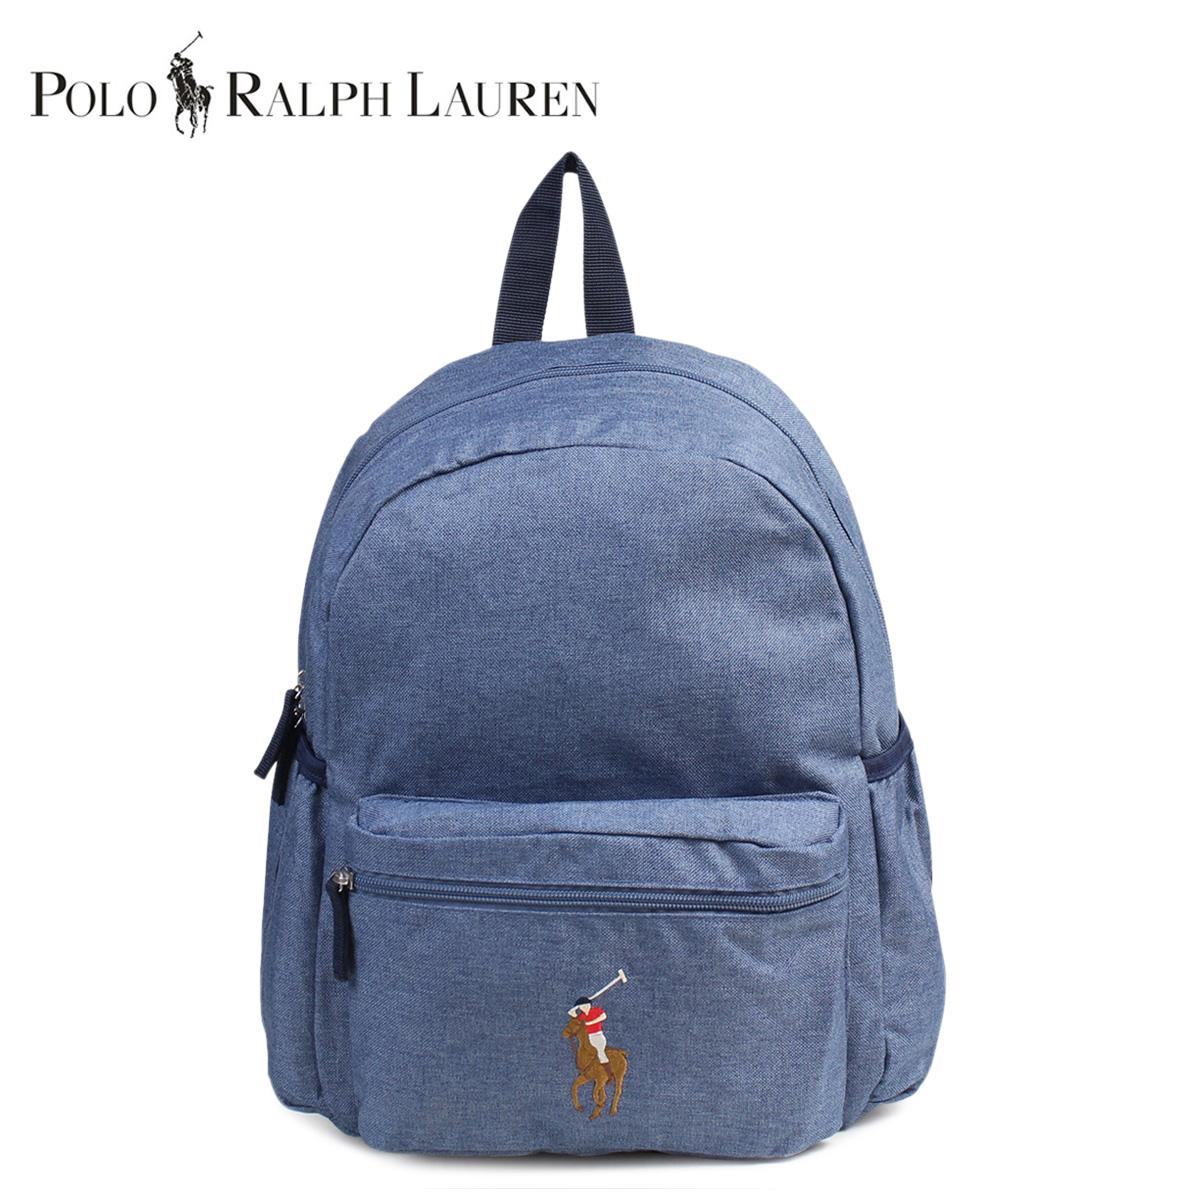 36984aeb0 Ralph Lauren rucksack bag backpack kids big pony POLO RALPH LAUREN polo  blue  7  ...